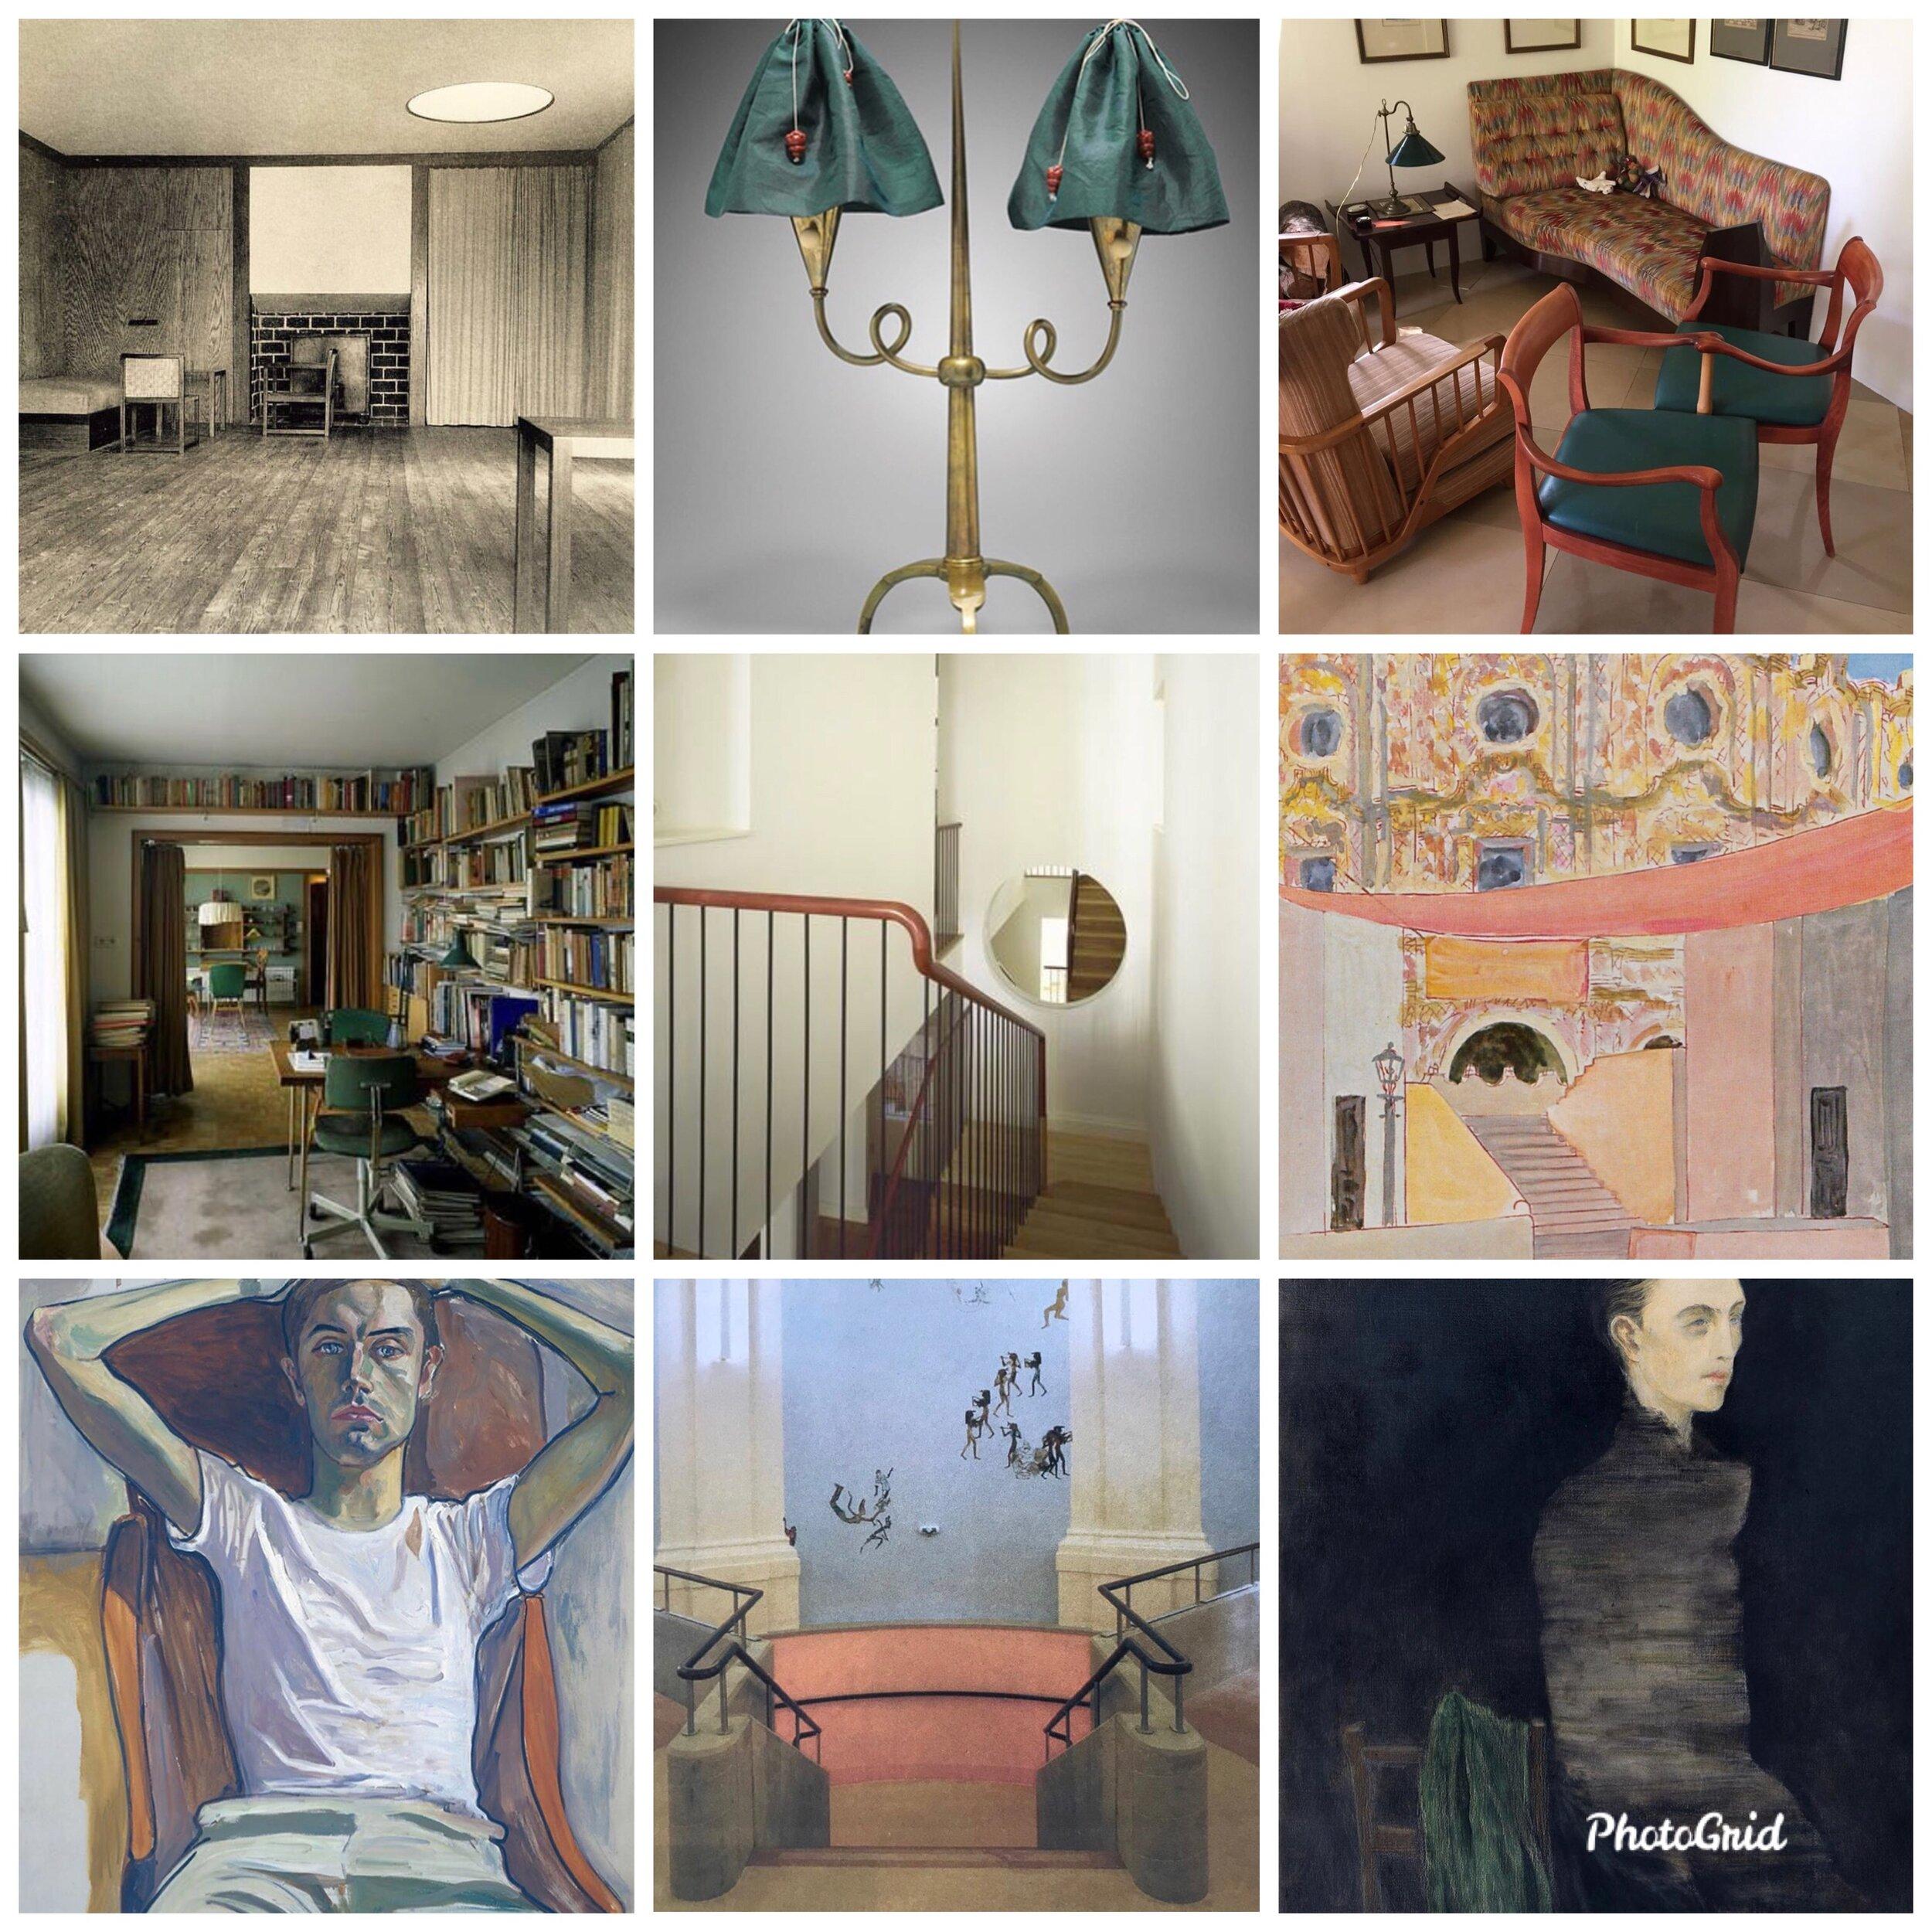 @PHARDRUS: FANTASTIC ROOMS ENCOUNTER FANTASTIC HUMANS.